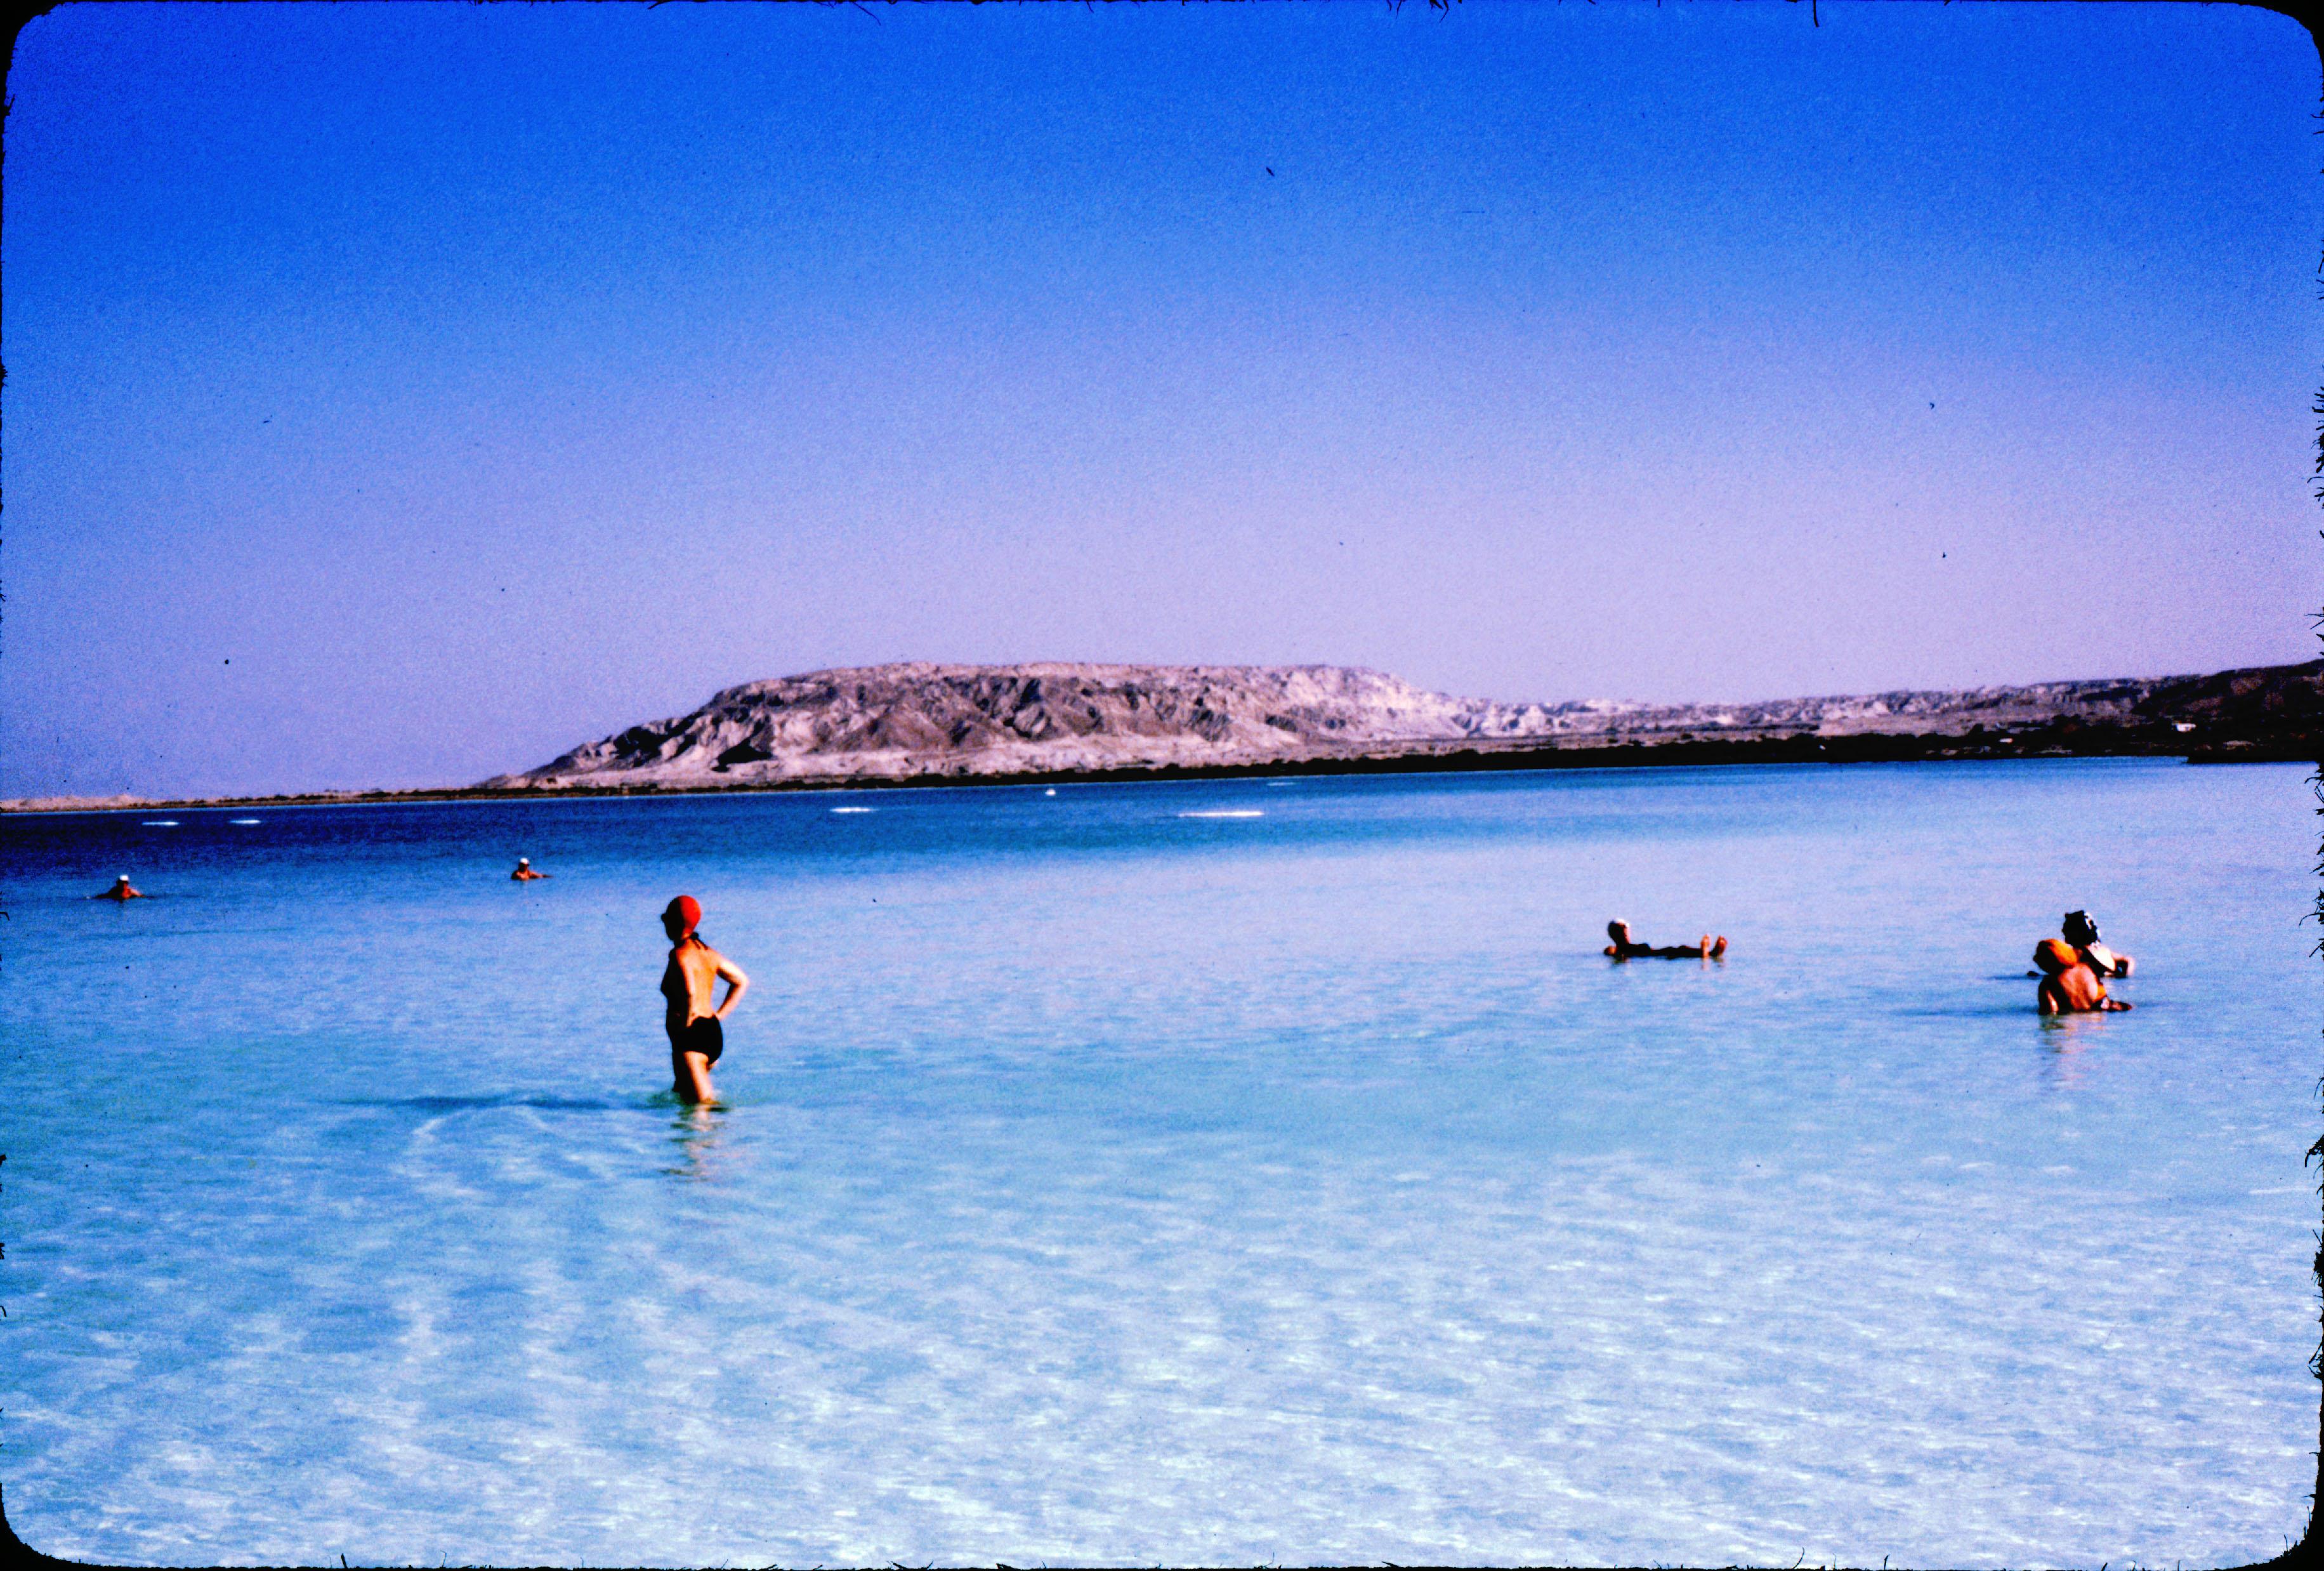 file:dead sea, israel (27637371153) - wikimedia commons